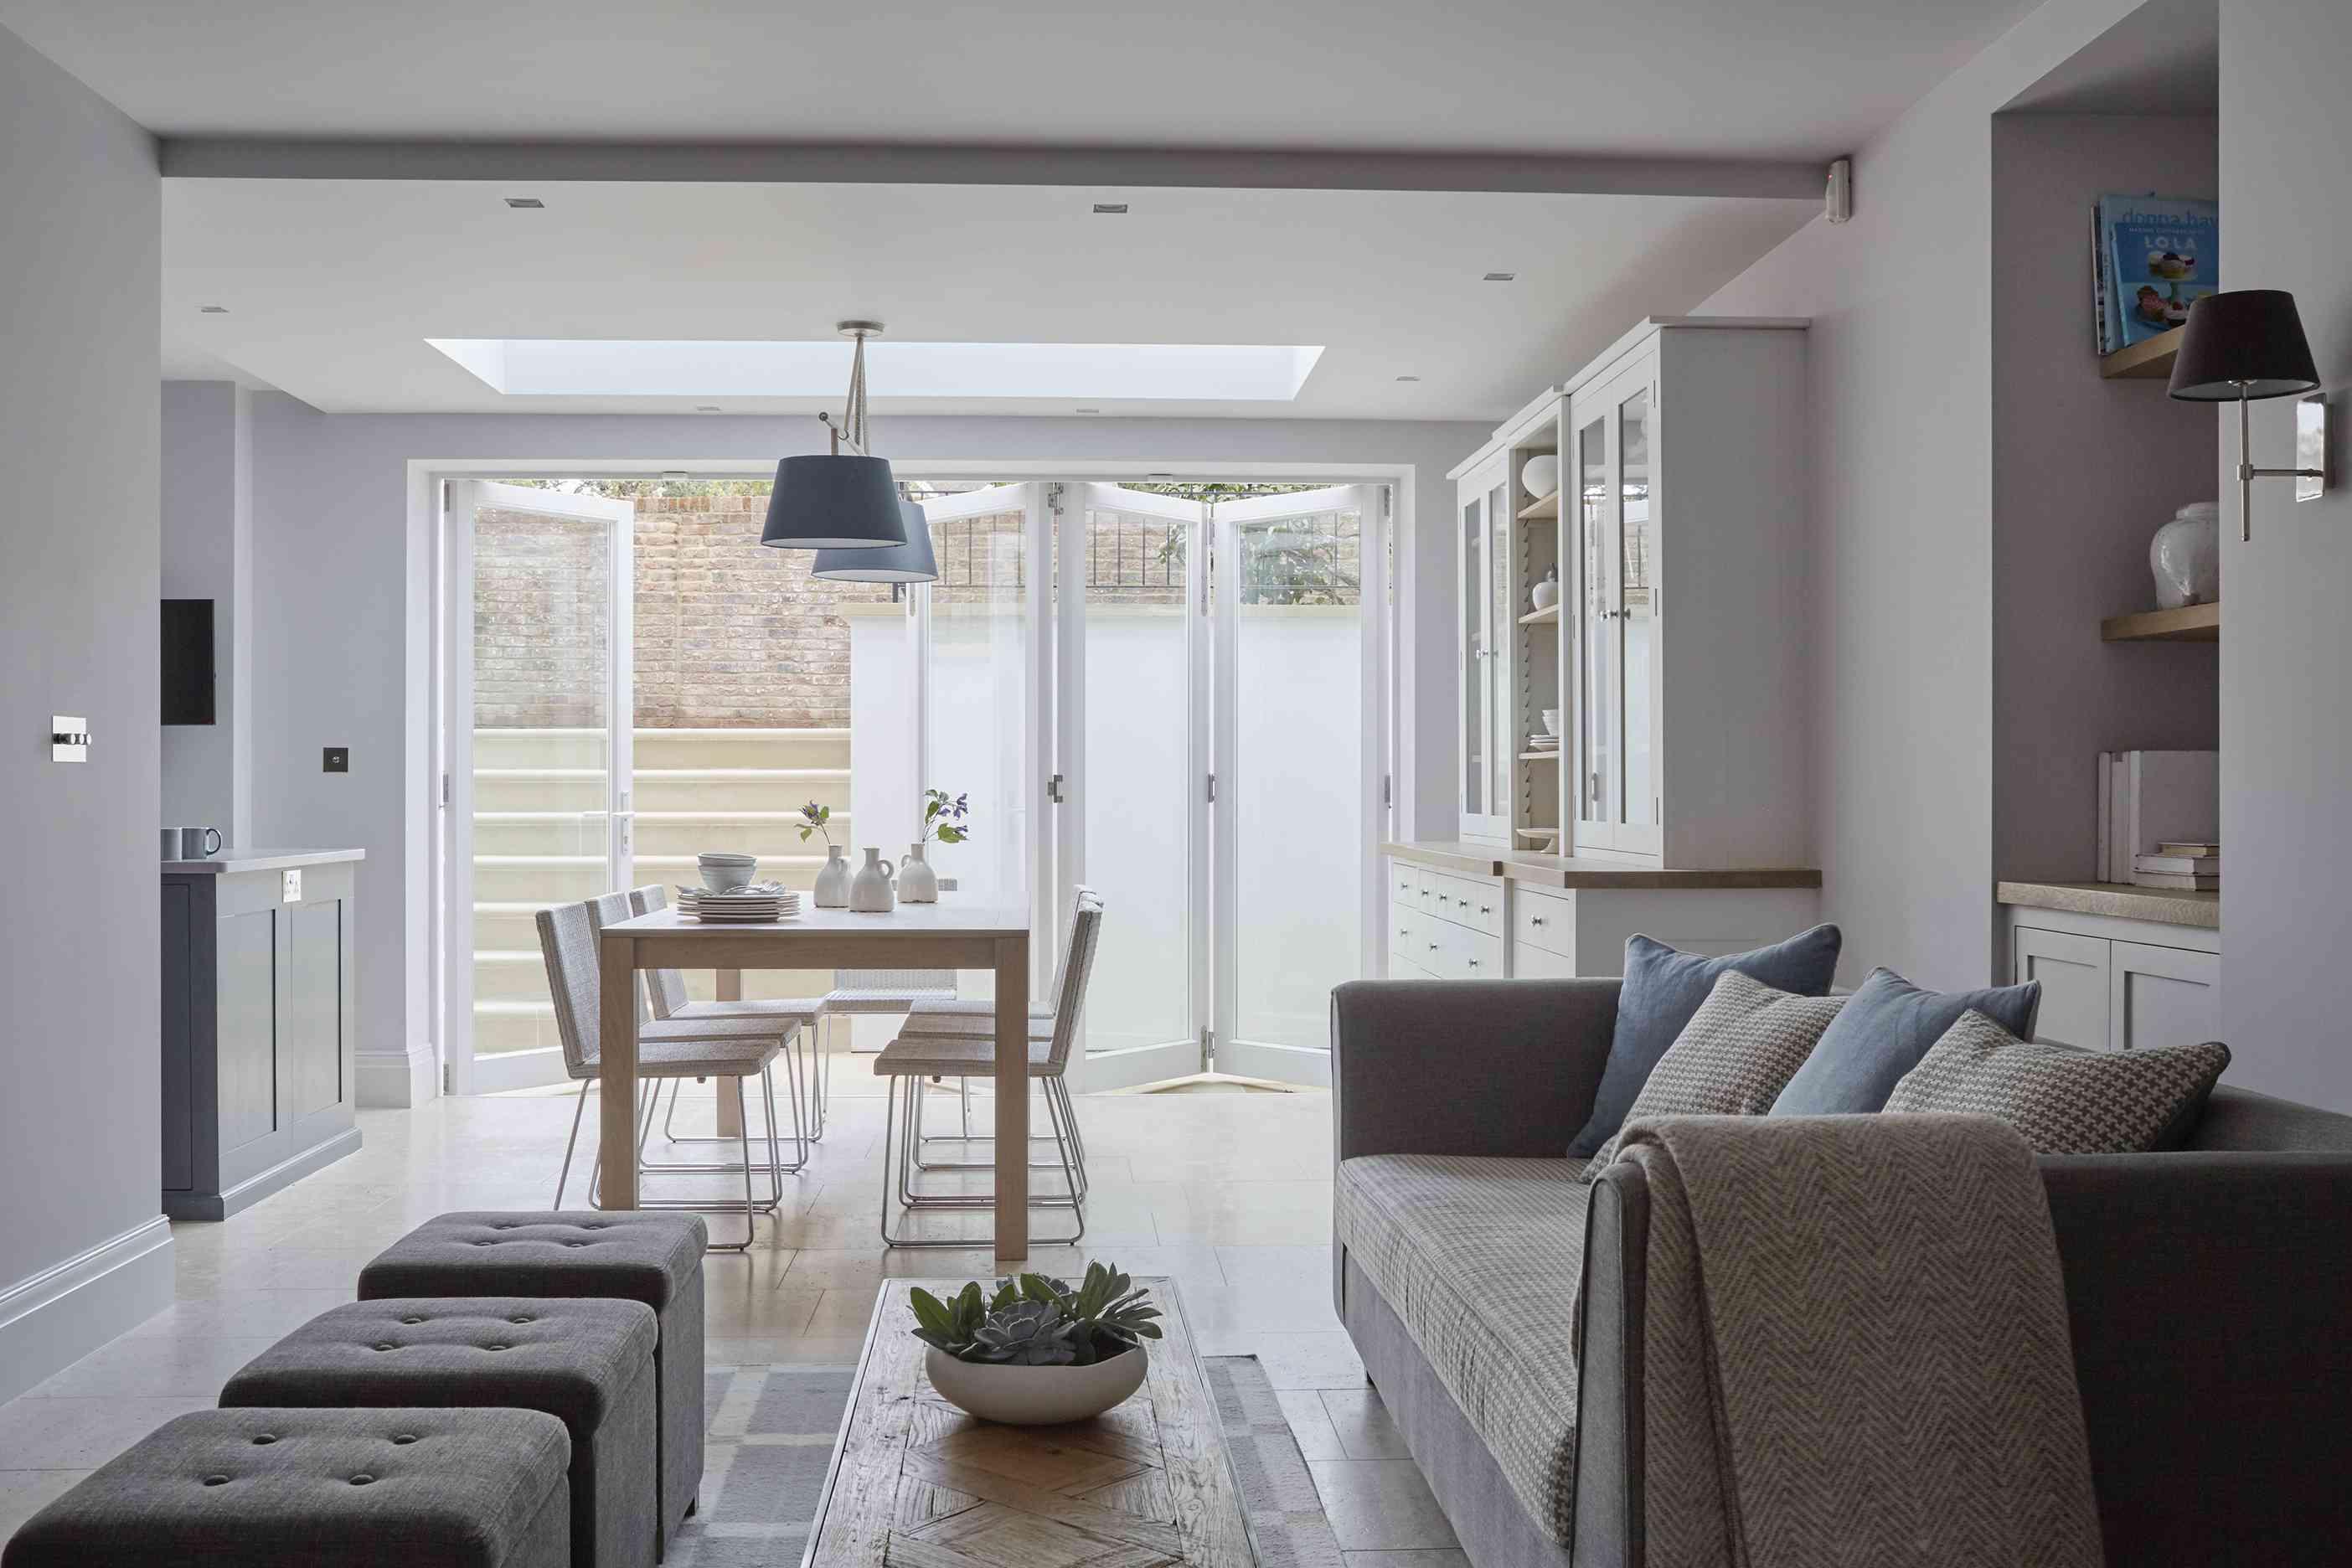 British designer Emma Sims-Hilditch's design features accordion doors to connect indoor and outdoor spaces